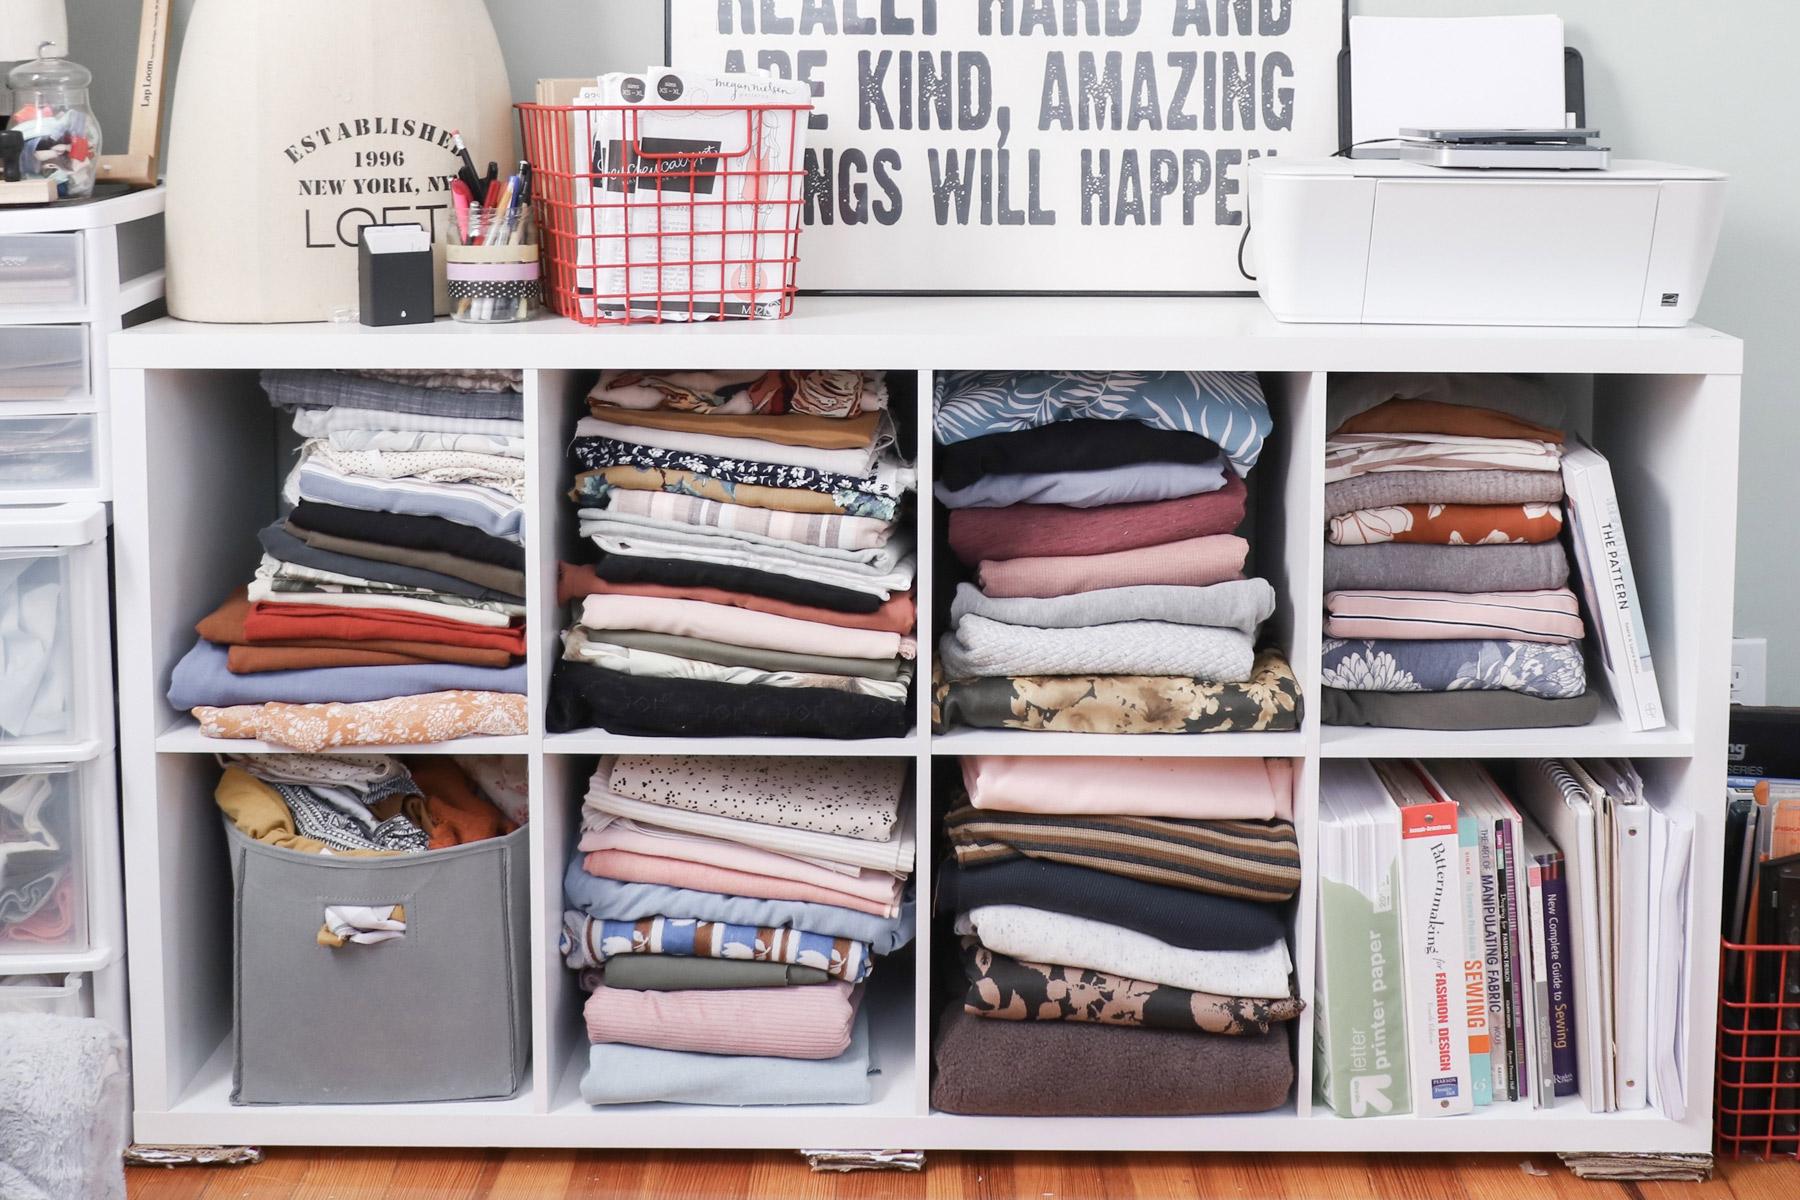 Megan Nielsen Patterns - Holly's fabric stash